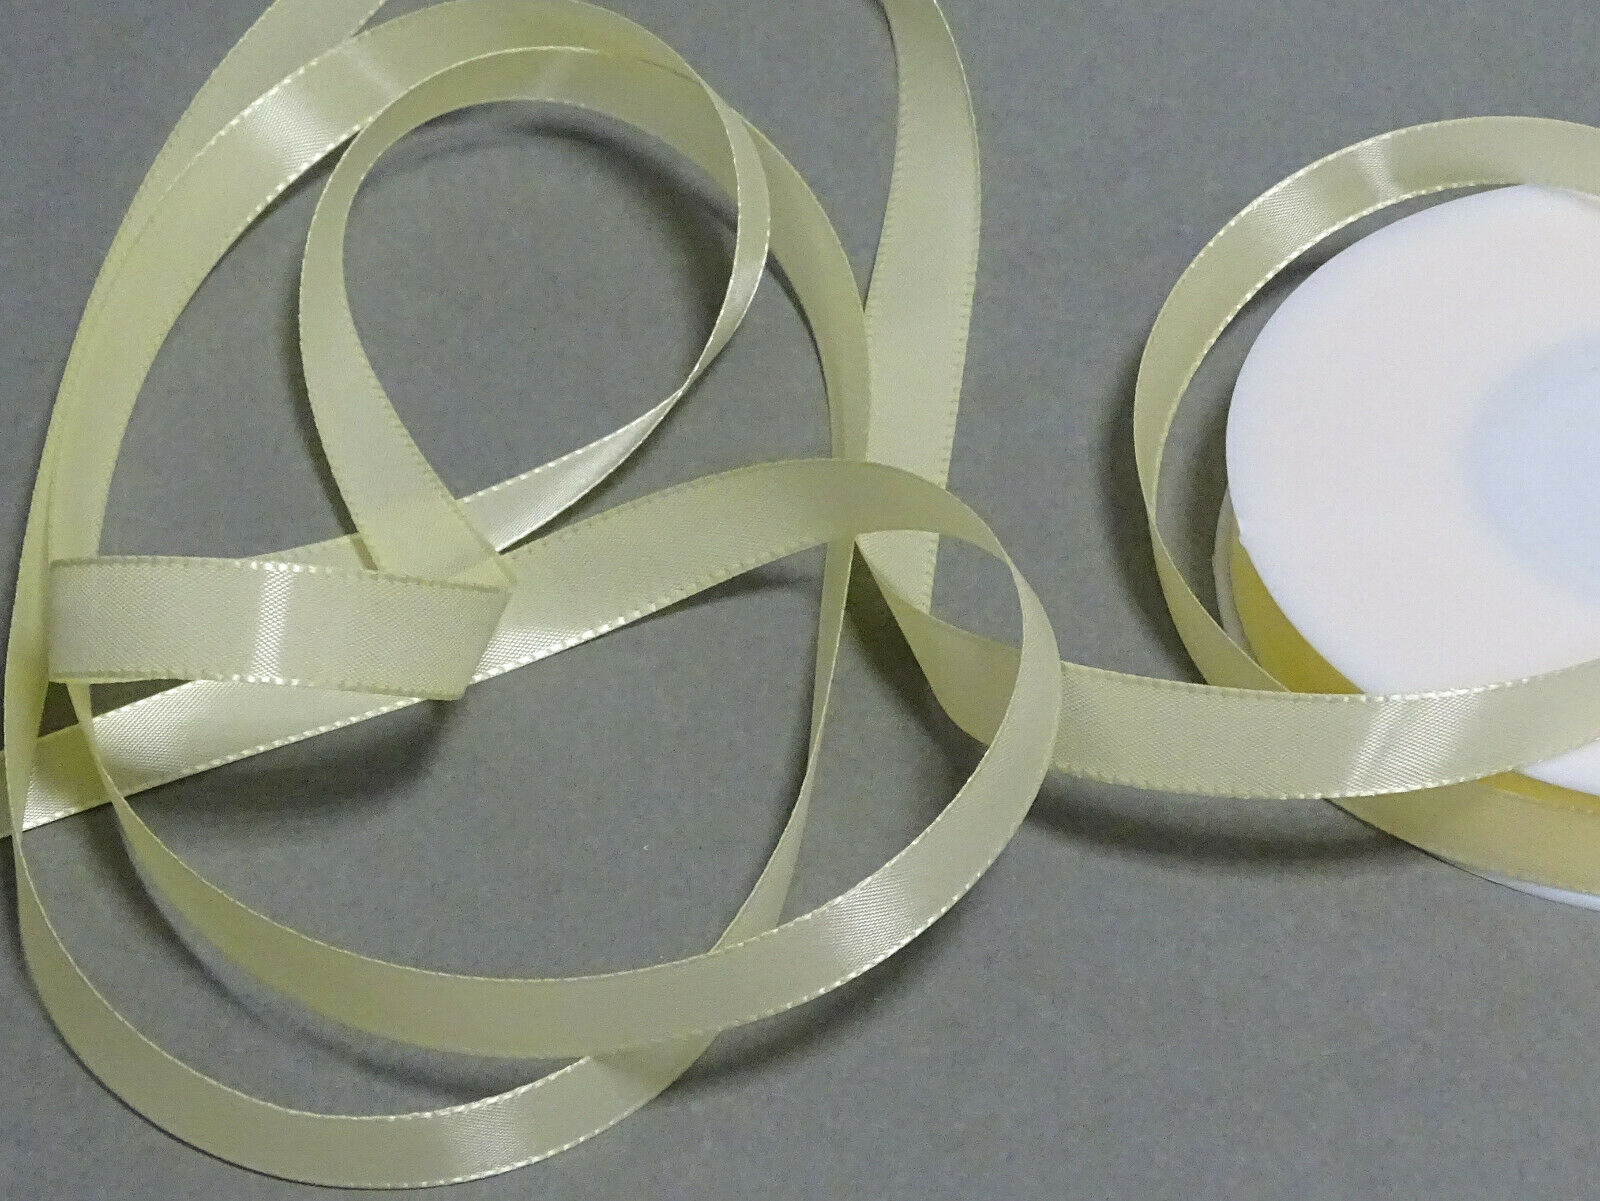 Seidenband Schleifenband 50 m x 15 mm / 40 mm Dekoband ab 0,08 €/m Geschenkband  - Creme 105, 40 mm x 50 m